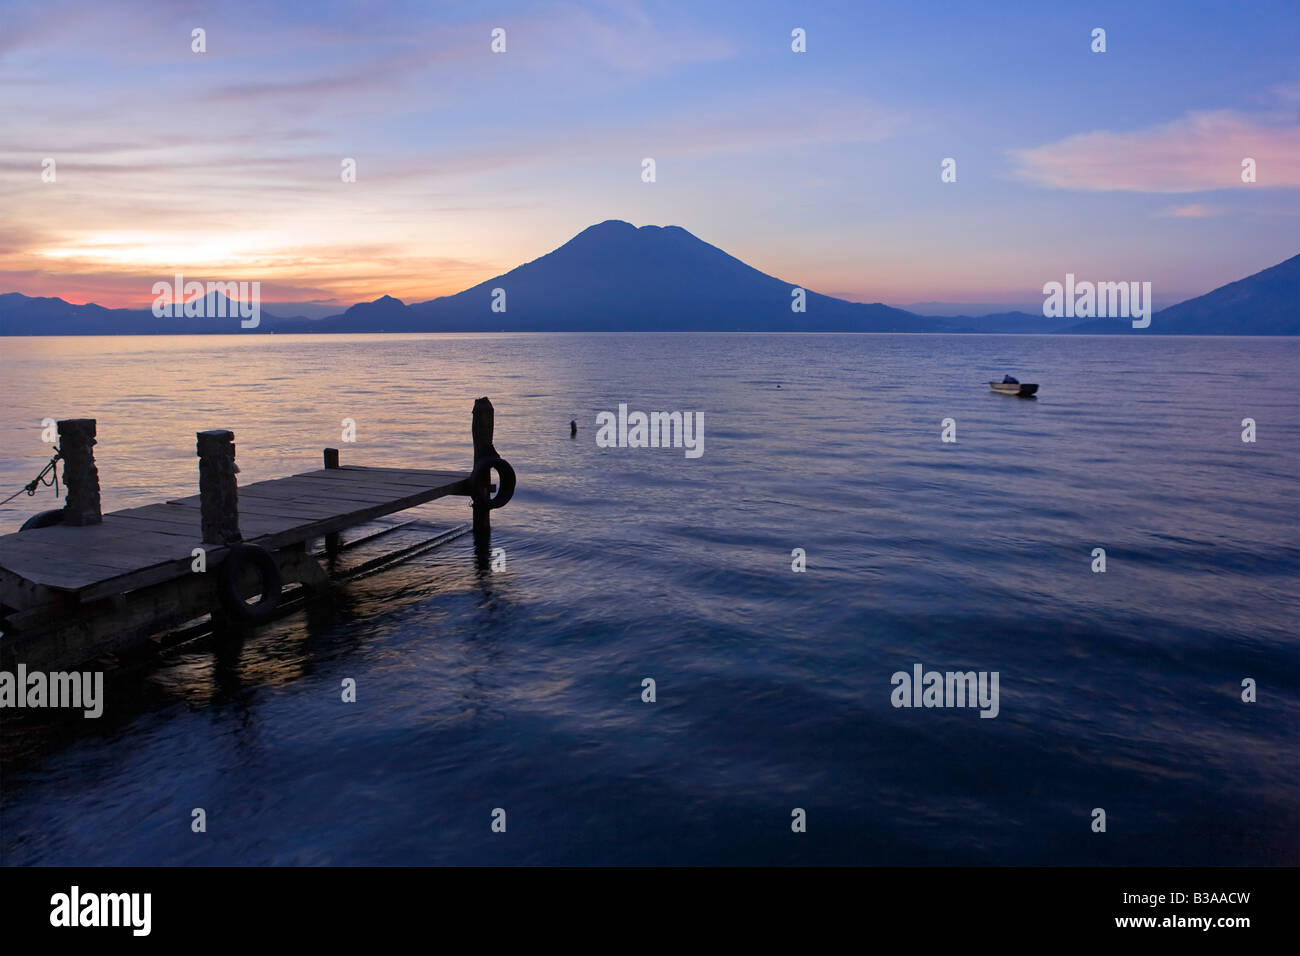 Jetty, Lake Atitlan and Volcano San Pedro, dawn, Guatemala - Stock Image